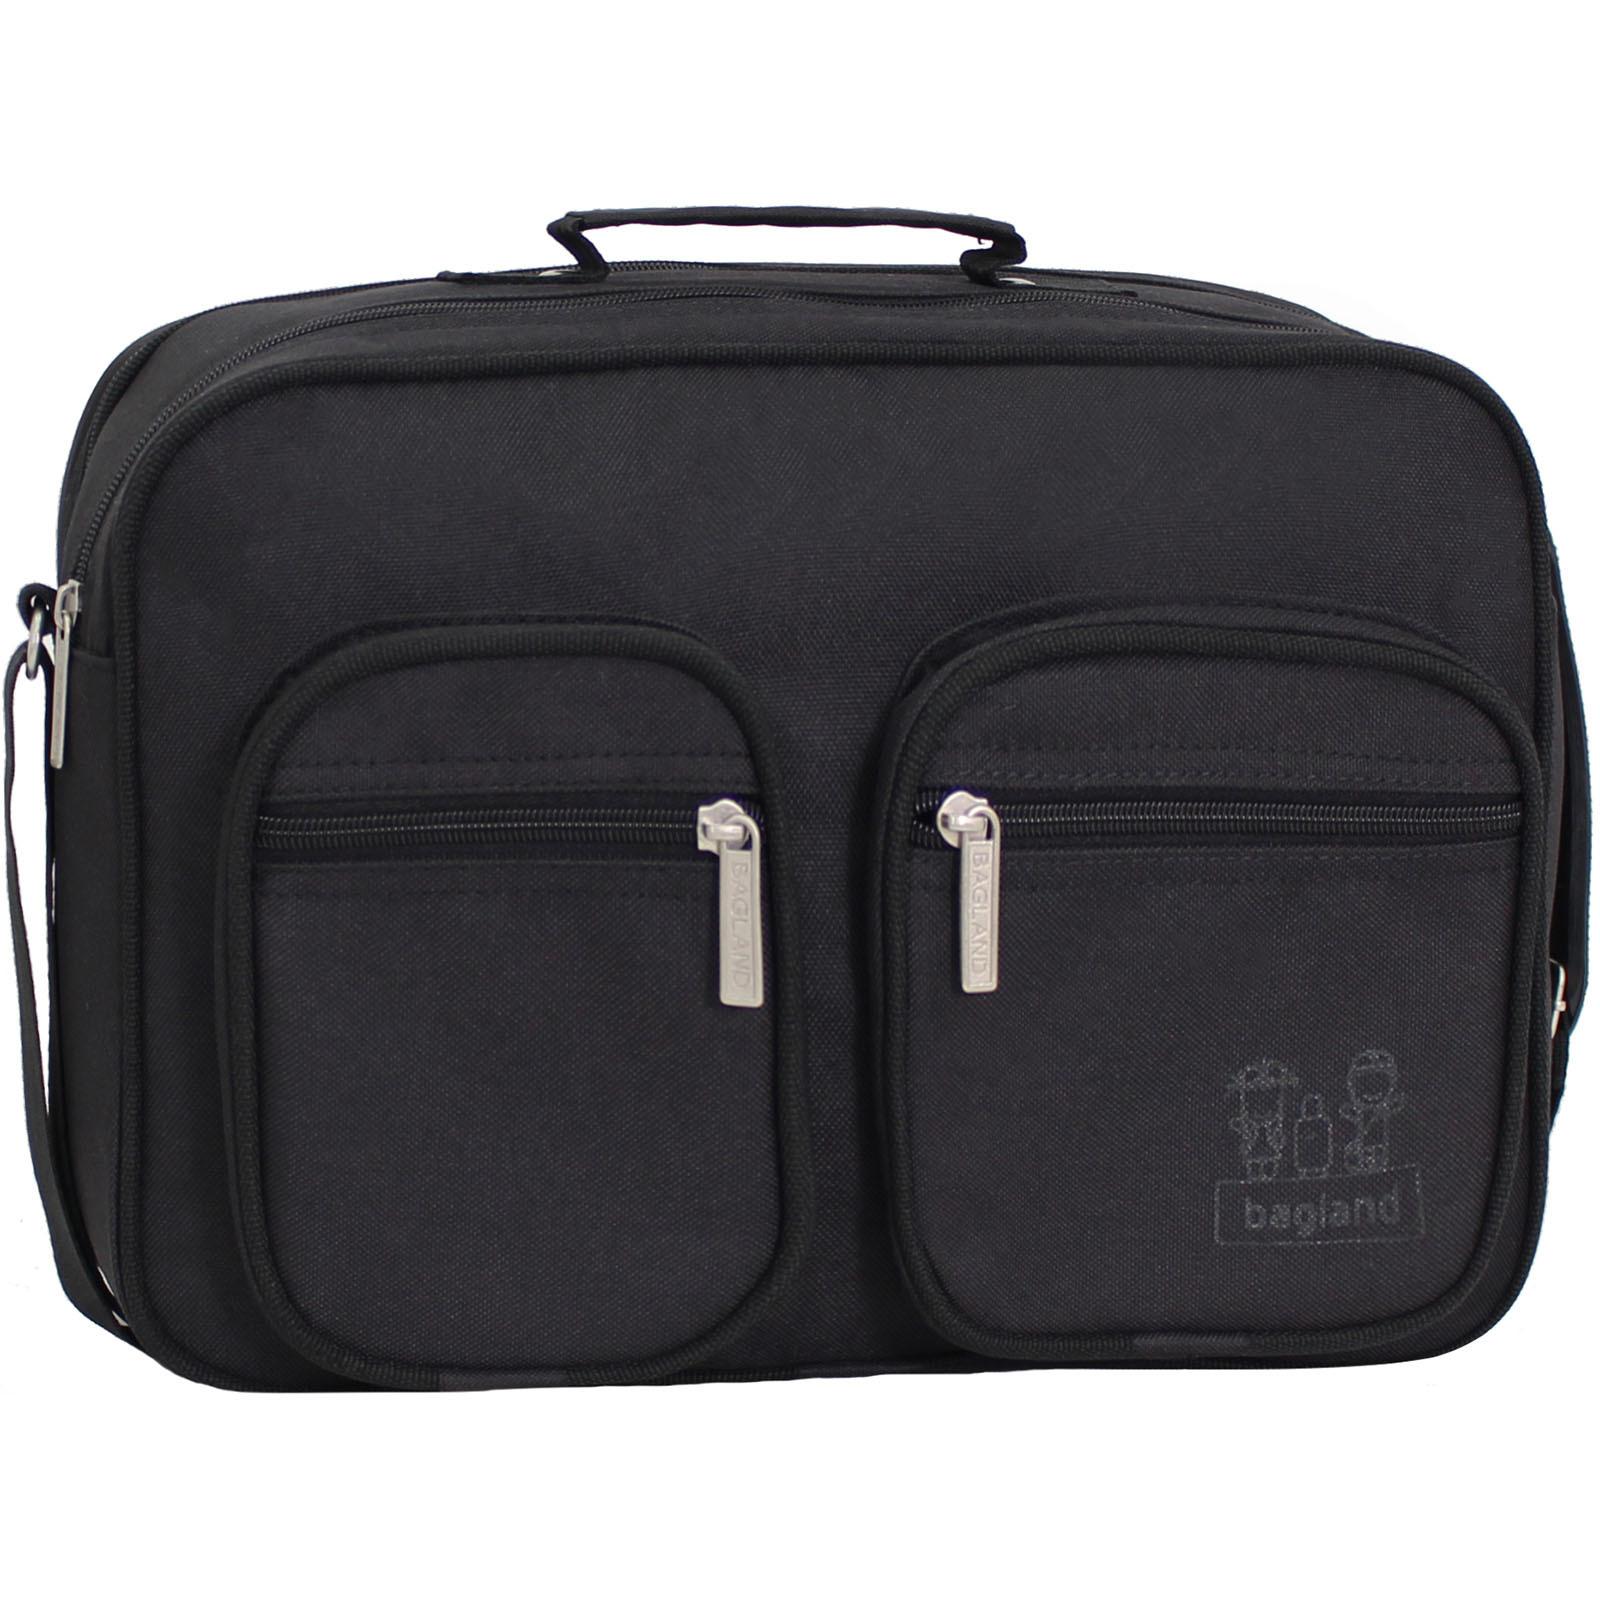 Сумки через плечо Мужская сумка Bagland Mr.Black 11 л. Чёрный (0026466) IMG_9964.JPG